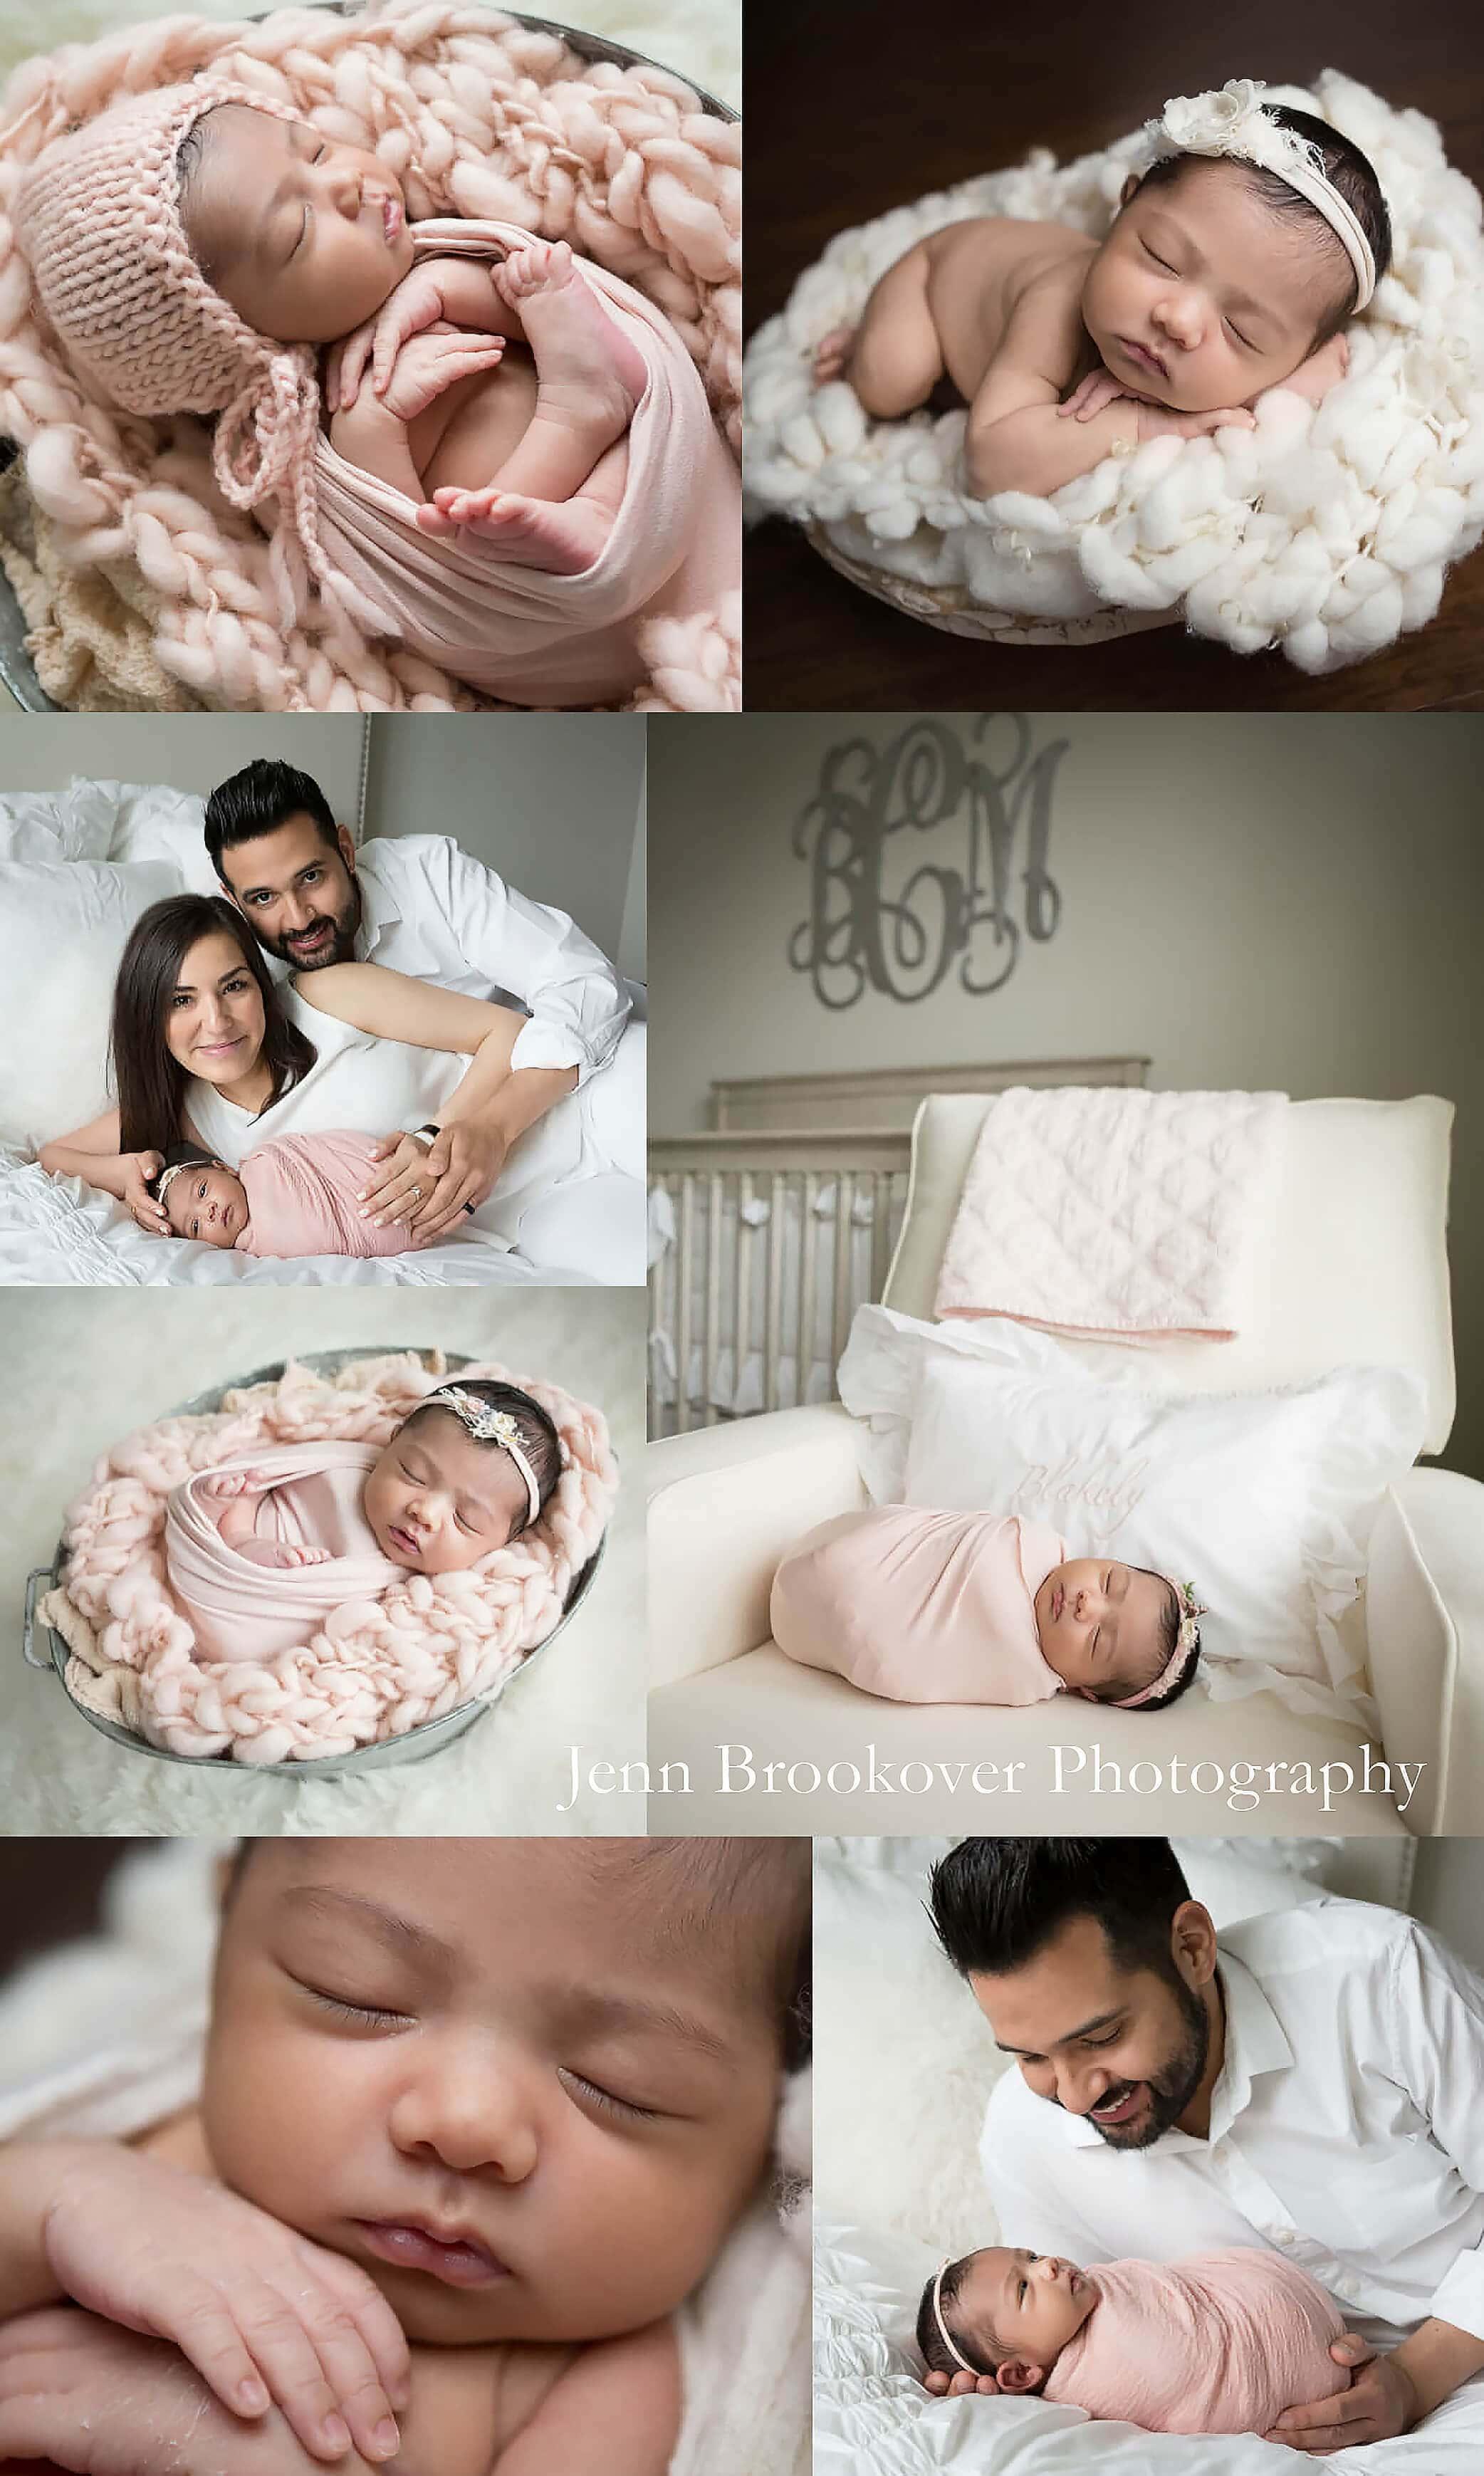 newborn baby girl session at home in San Antonio, Texas using cream, blush and gray